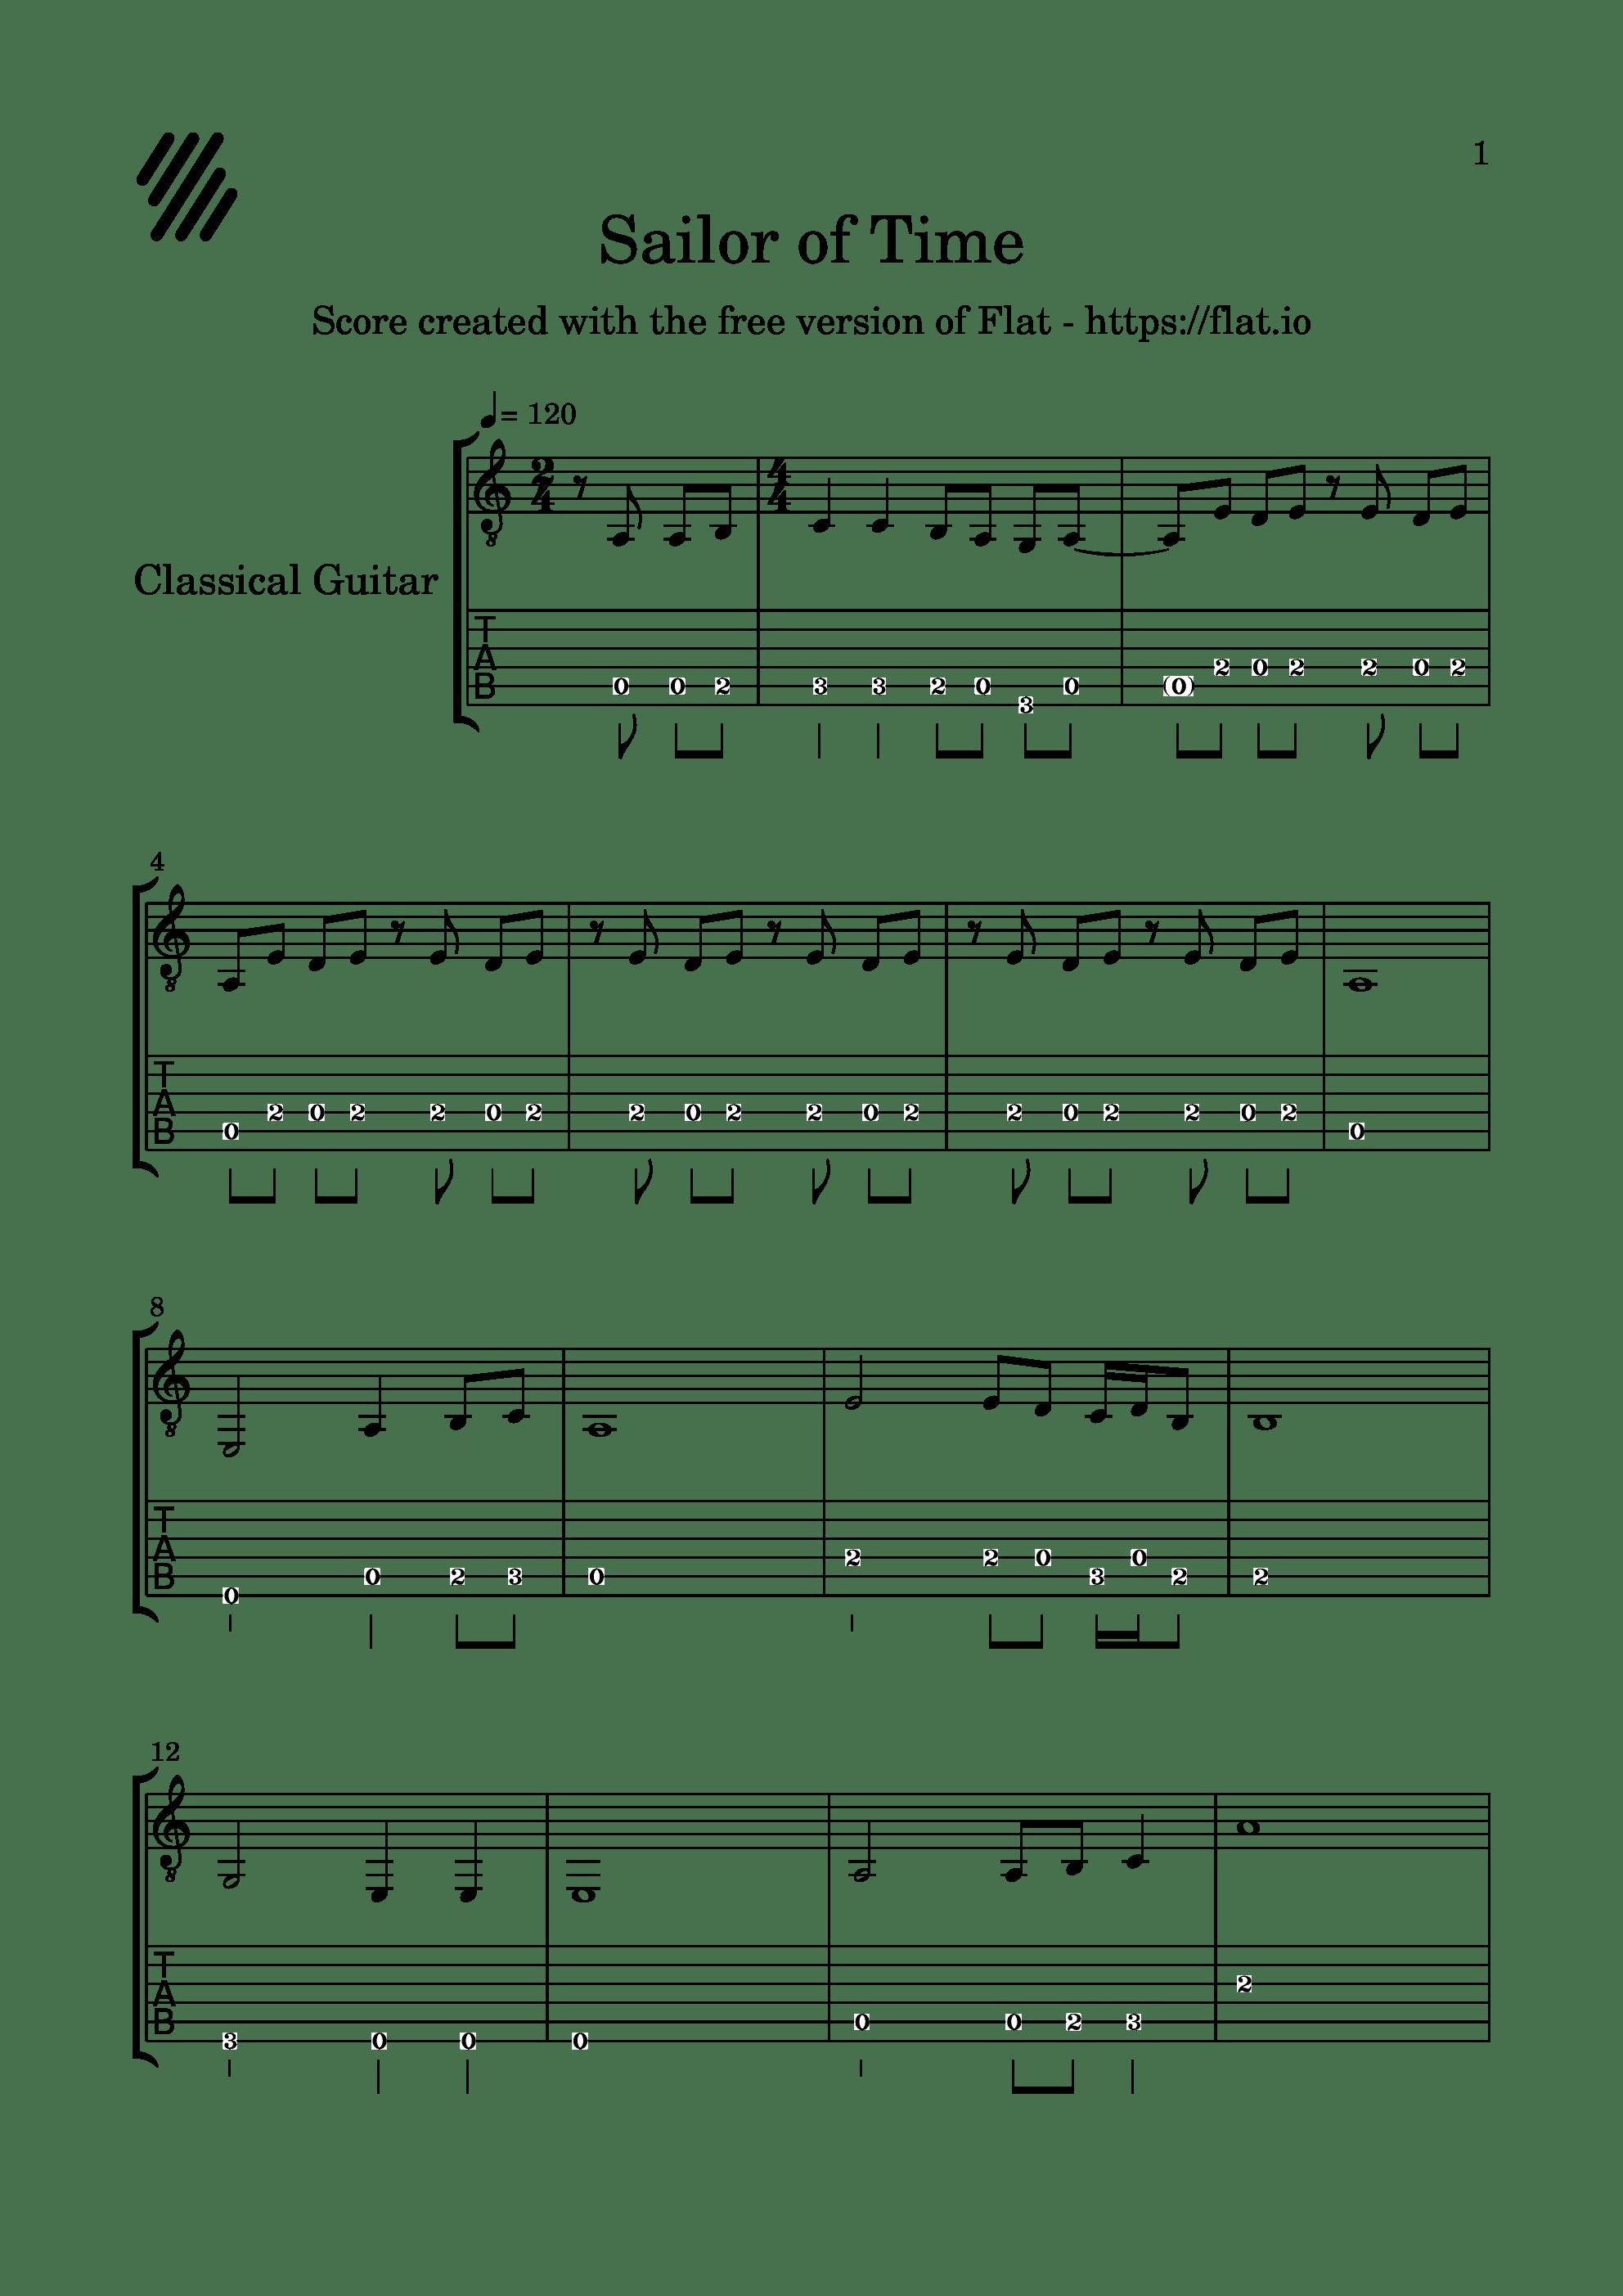 東方夢時空-Sailor of Time吉他谱1